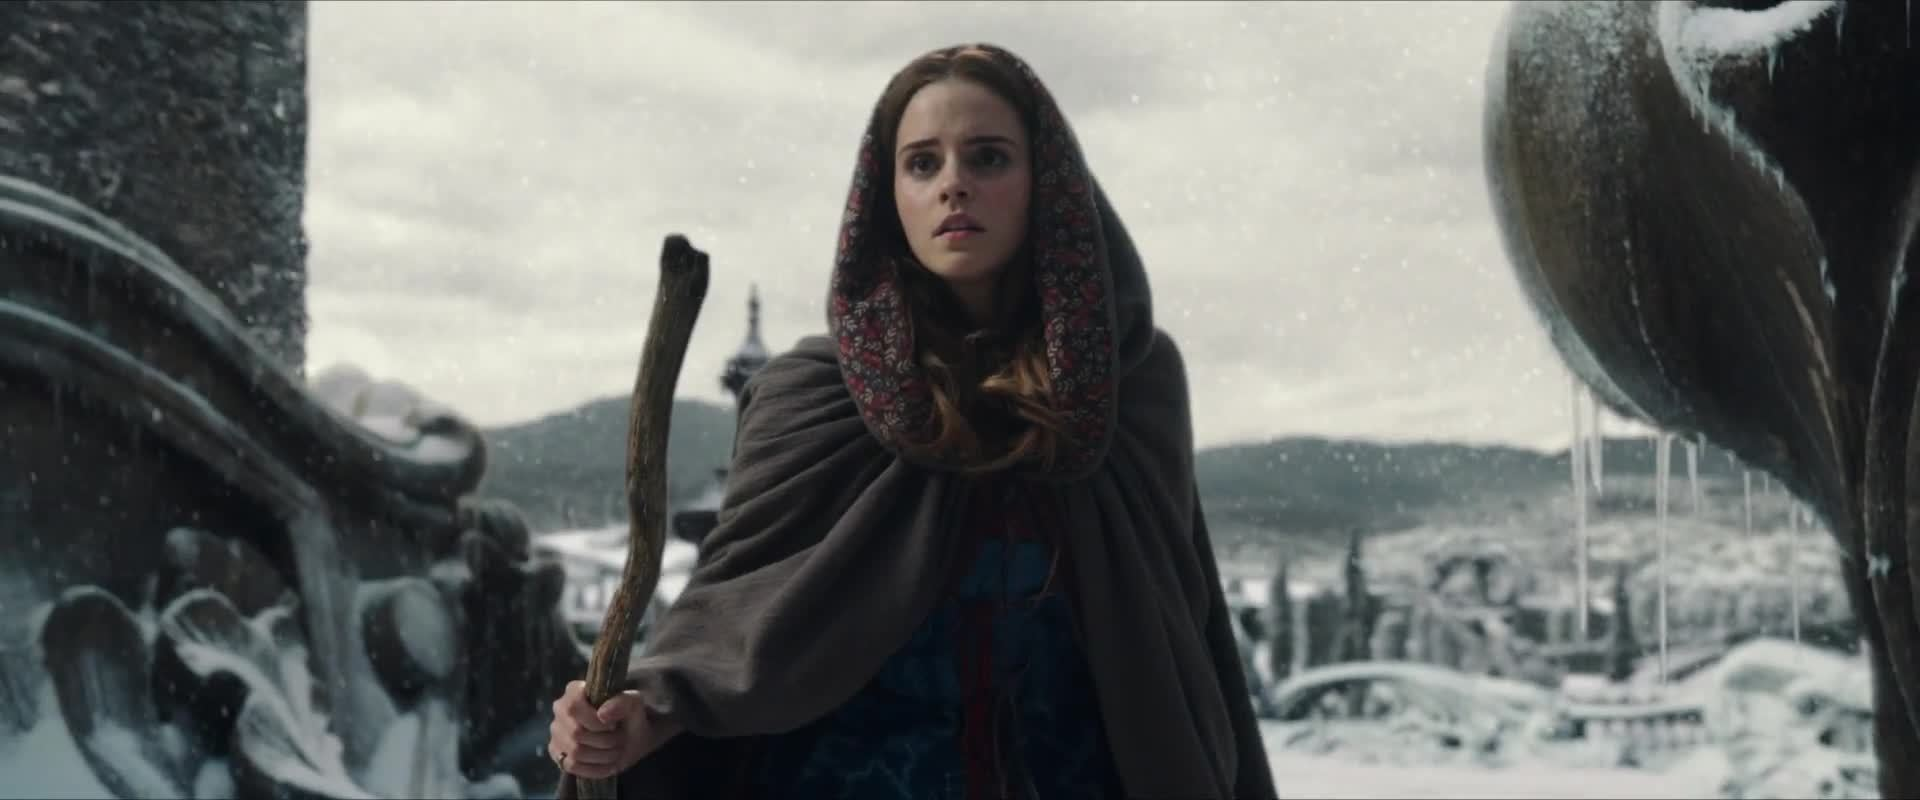 Golden Globes TV Spot - Disney's Beauty and the Beast